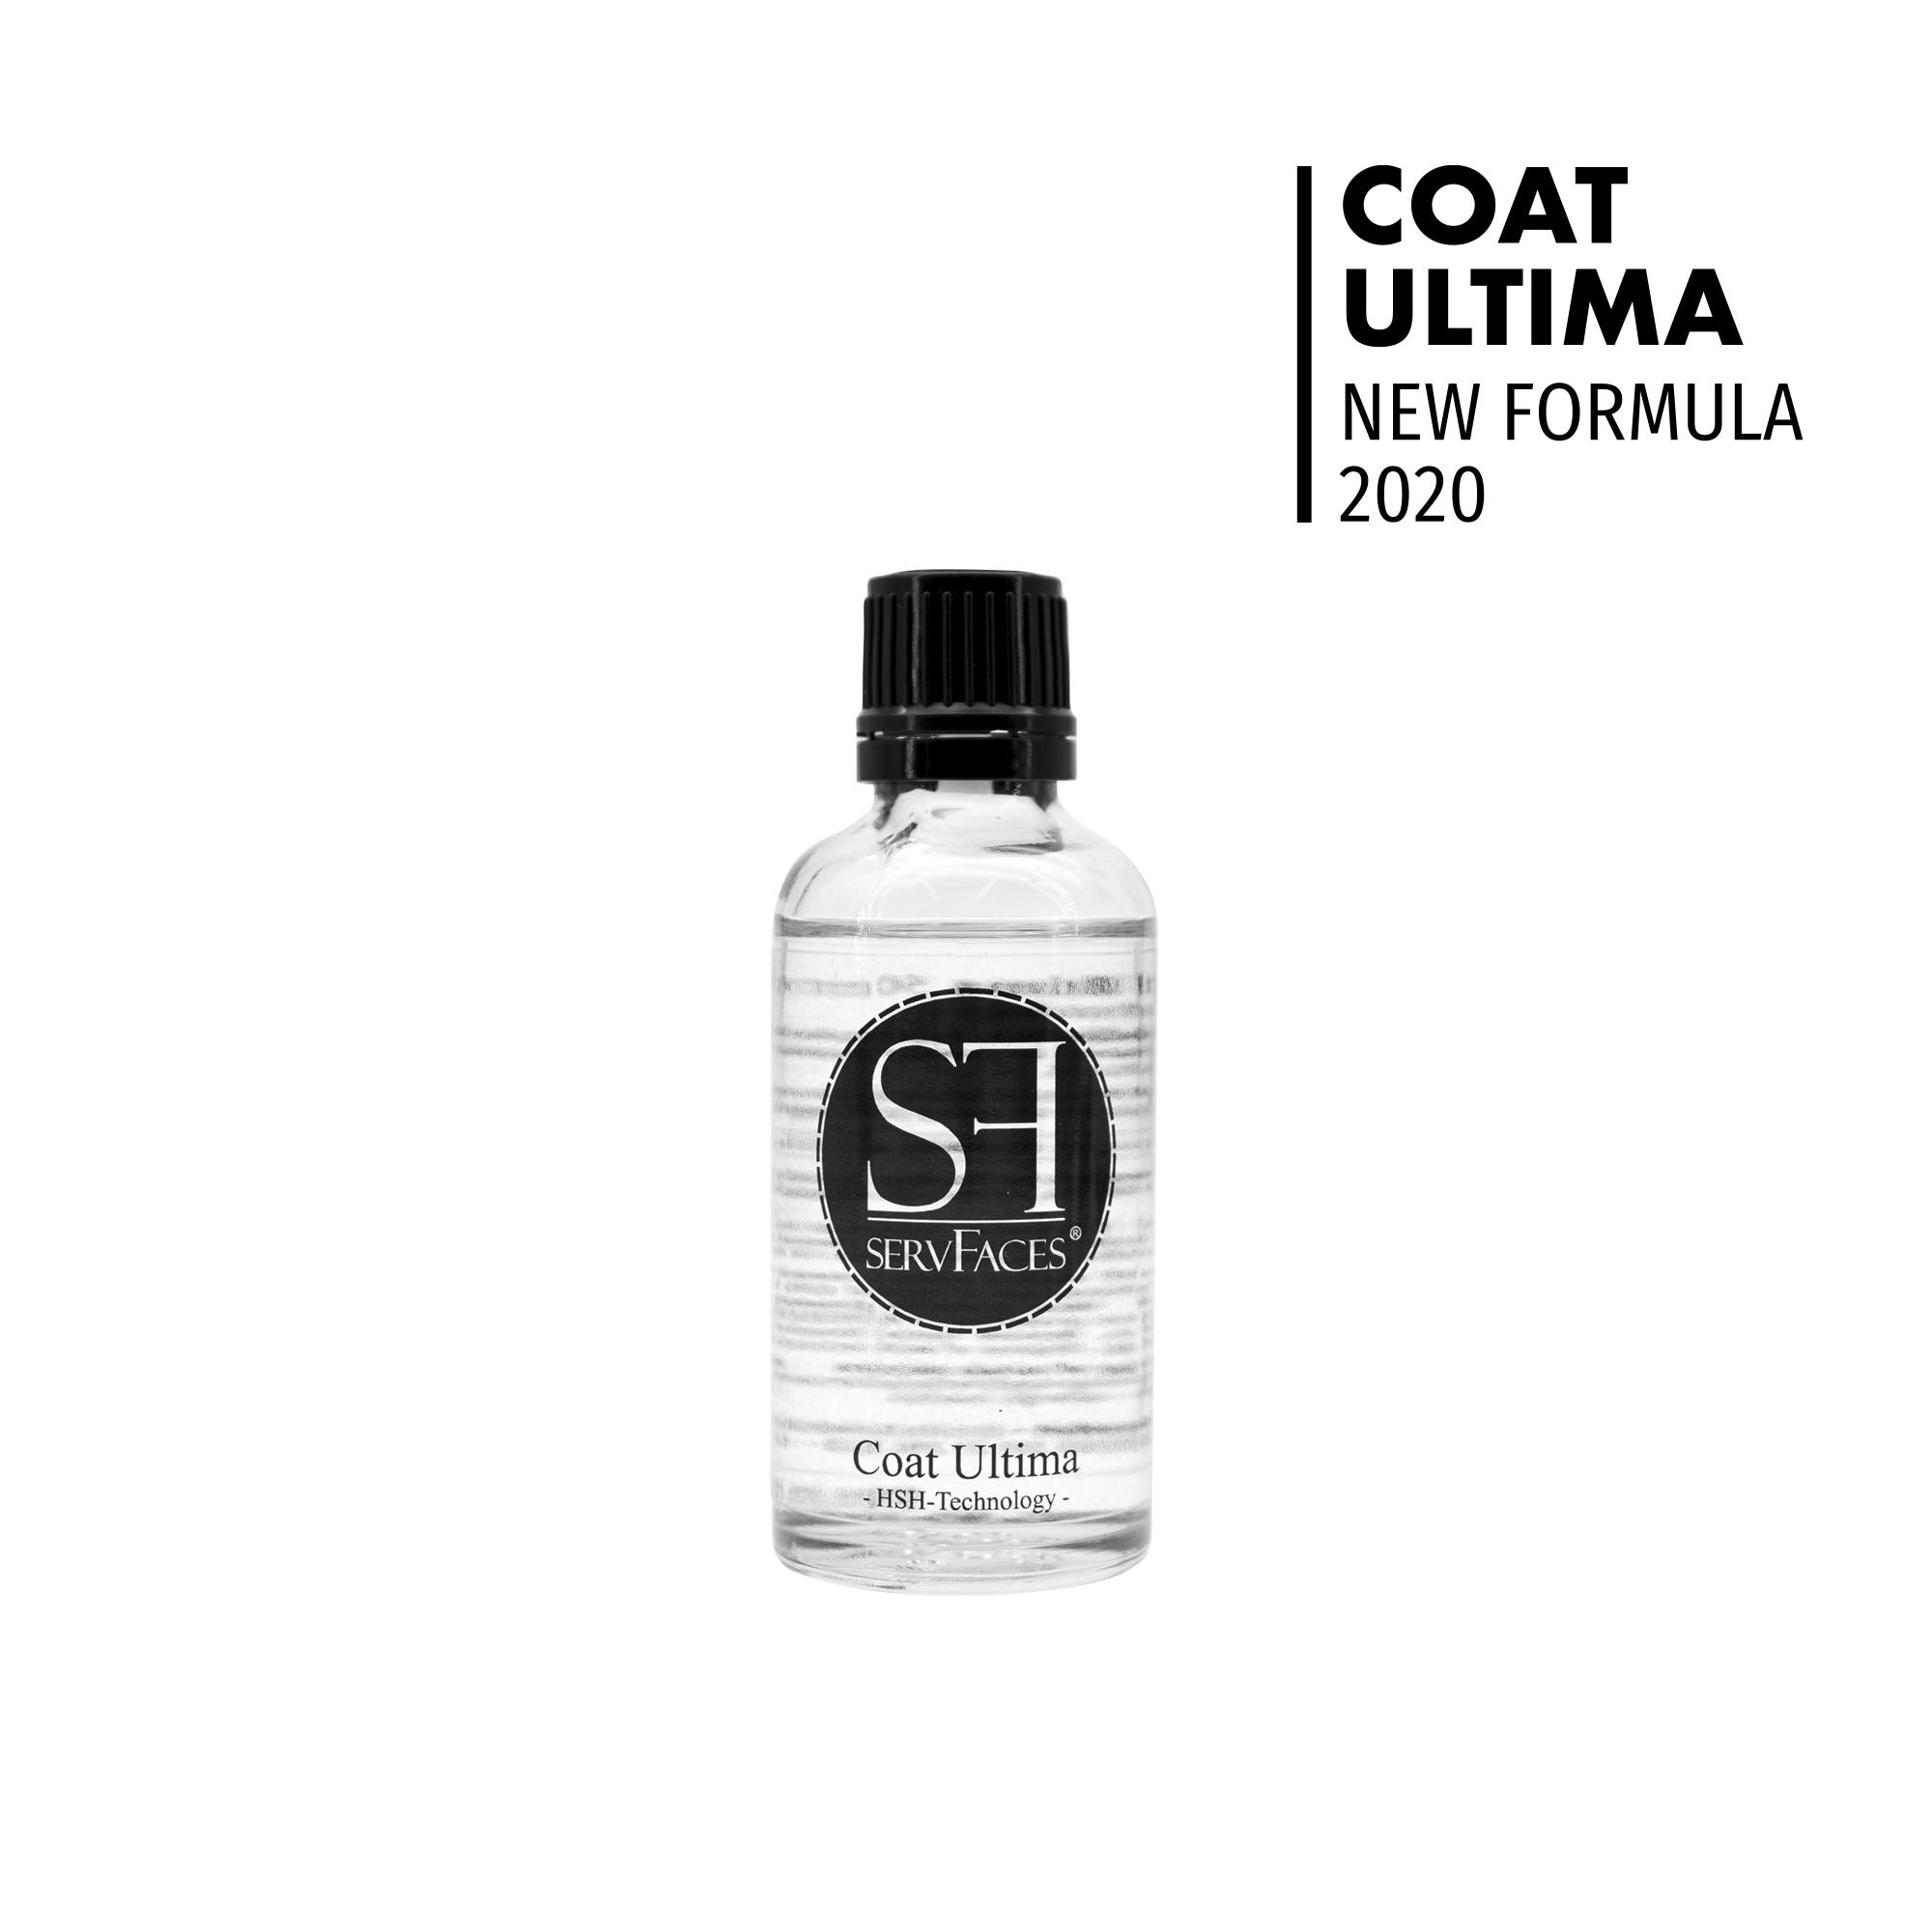 Coat Ultima - HSH-Technology